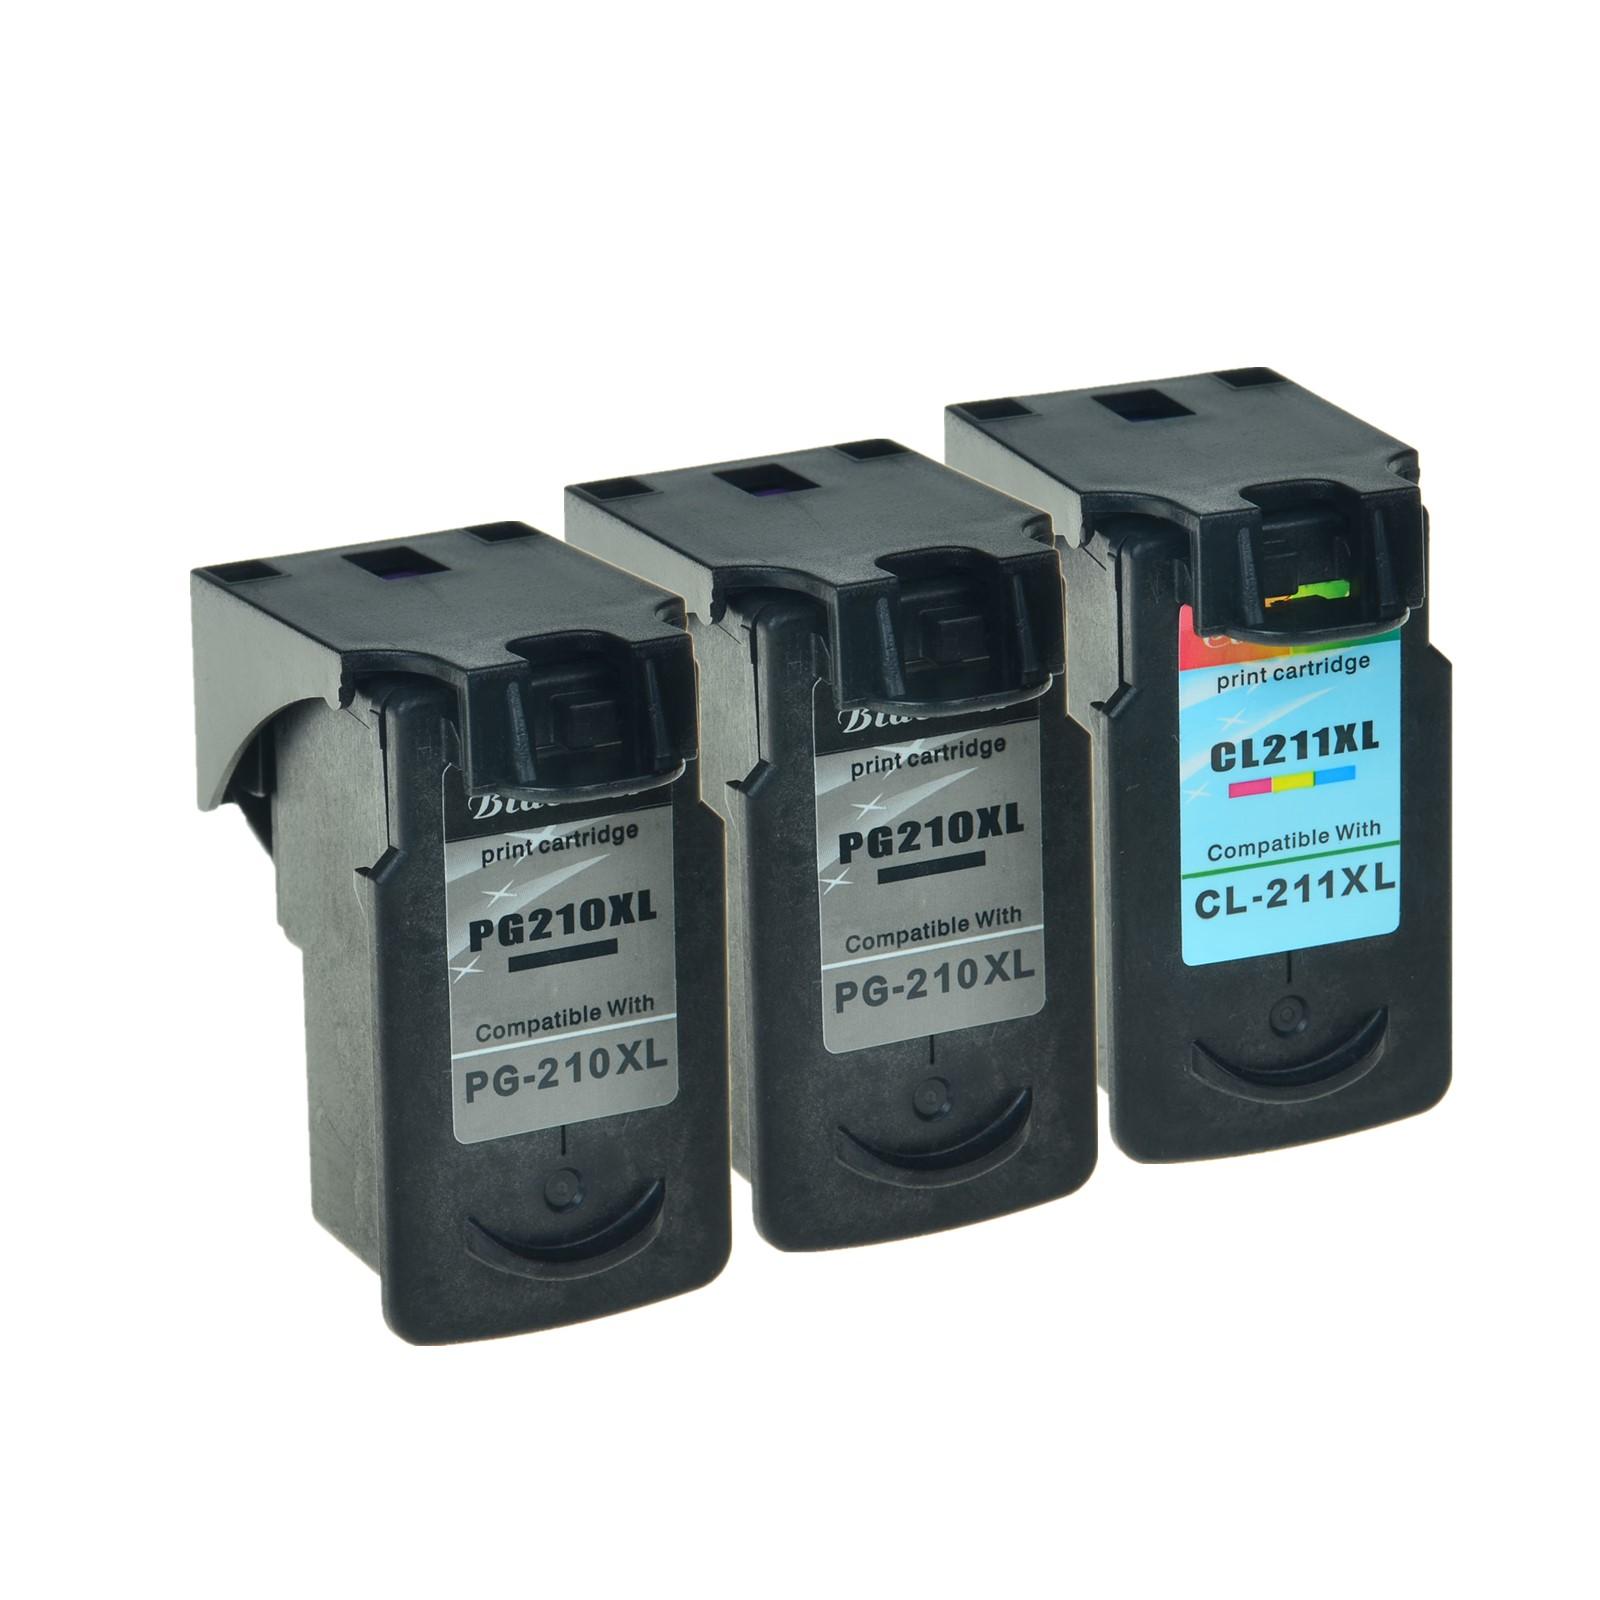 2PK 210XL Black 1PK 211XL Color Ink Cart For Canon PIXMA MP280 MP490 MP250 MP230